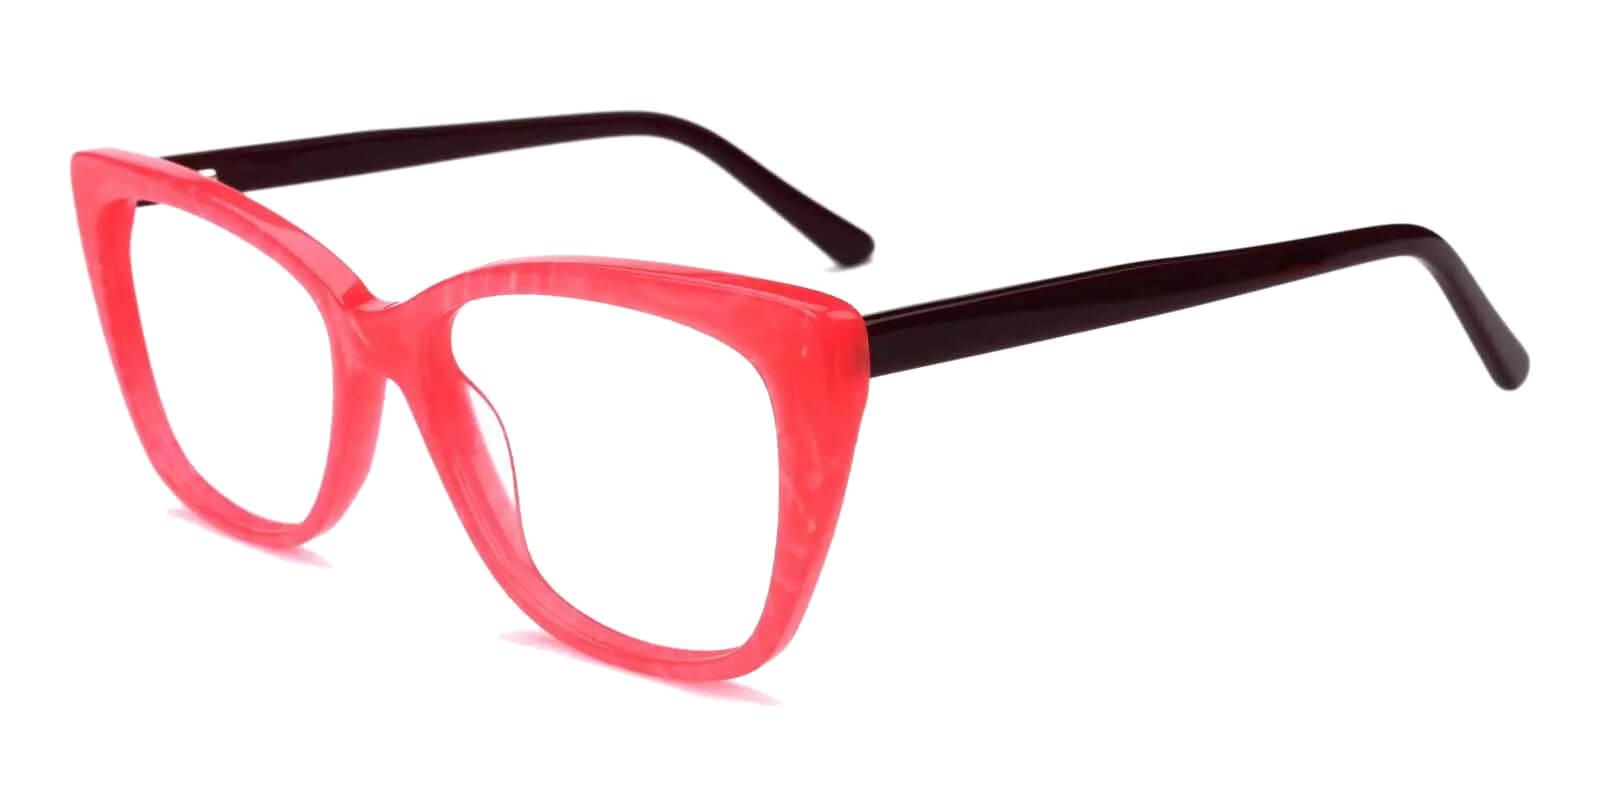 Truda Pink Acetate Eyeglasses , Fashion , SpringHinges , UniversalBridgeFit Frames from ABBE Glasses